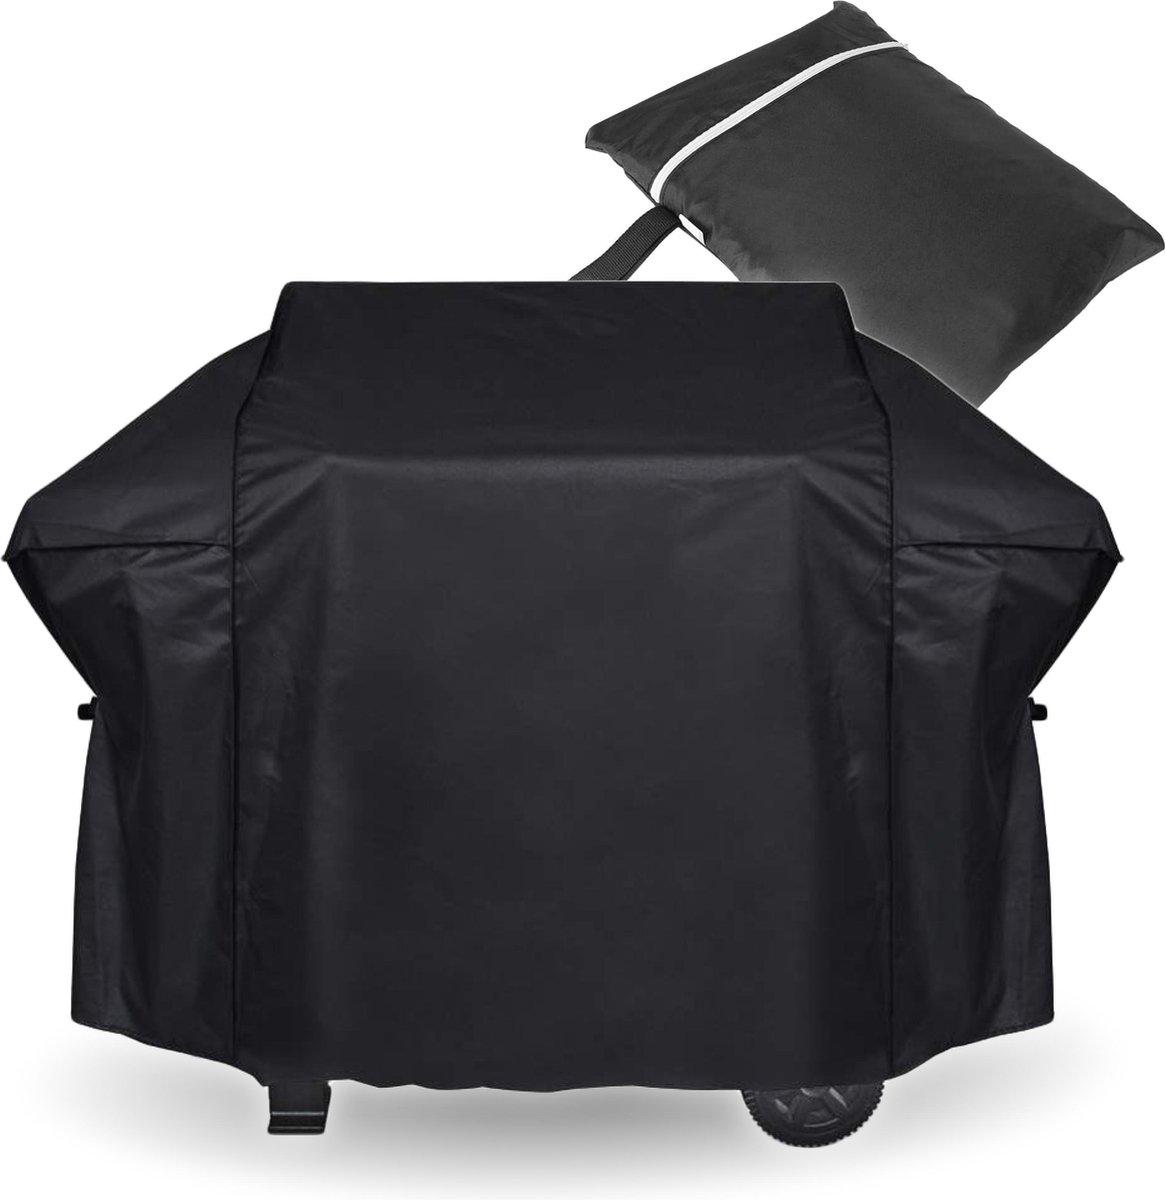 BBQ Accesoires - BBQ Hoes - BBQ Hoes Waterdicht - Hoes - Hoes BBQ - UV- en Waterdicht - 145 x 61 x 1